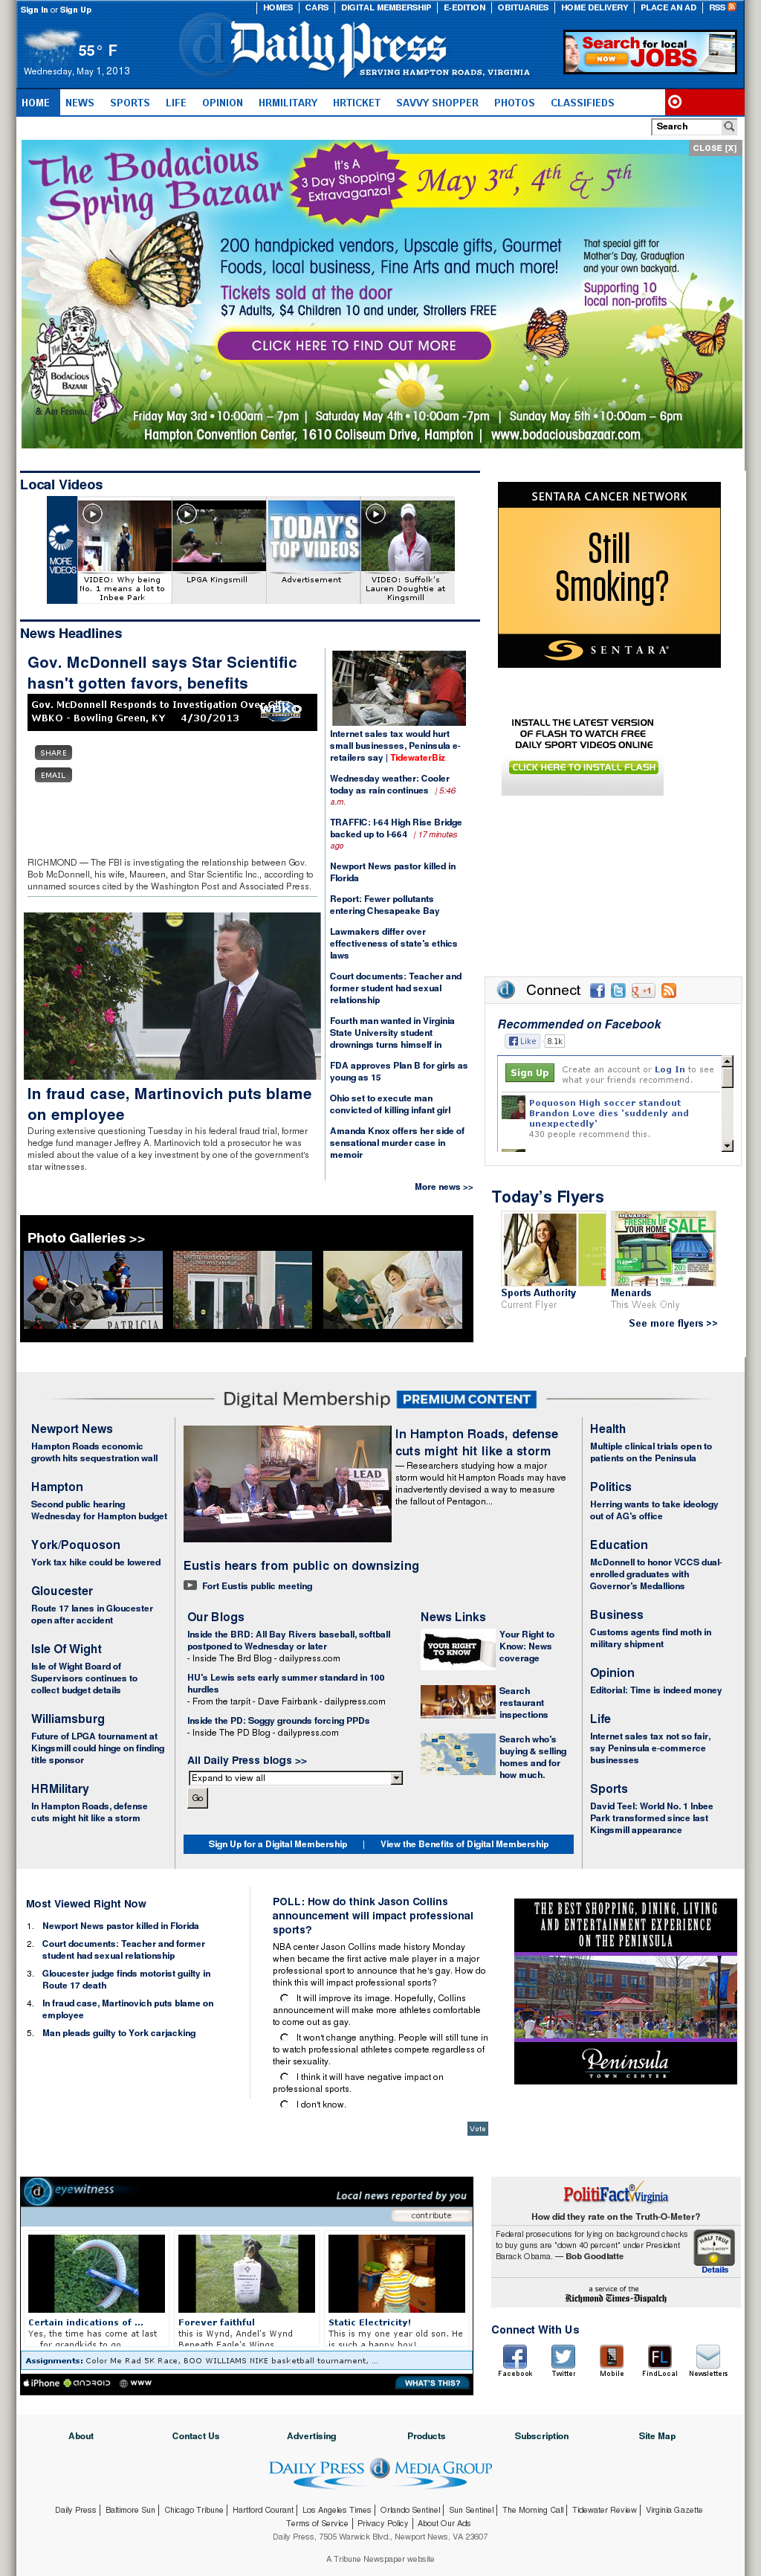 (Hampton Roads) Daily Press at Wednesday May 1, 2013, 12:04 p.m. UTC